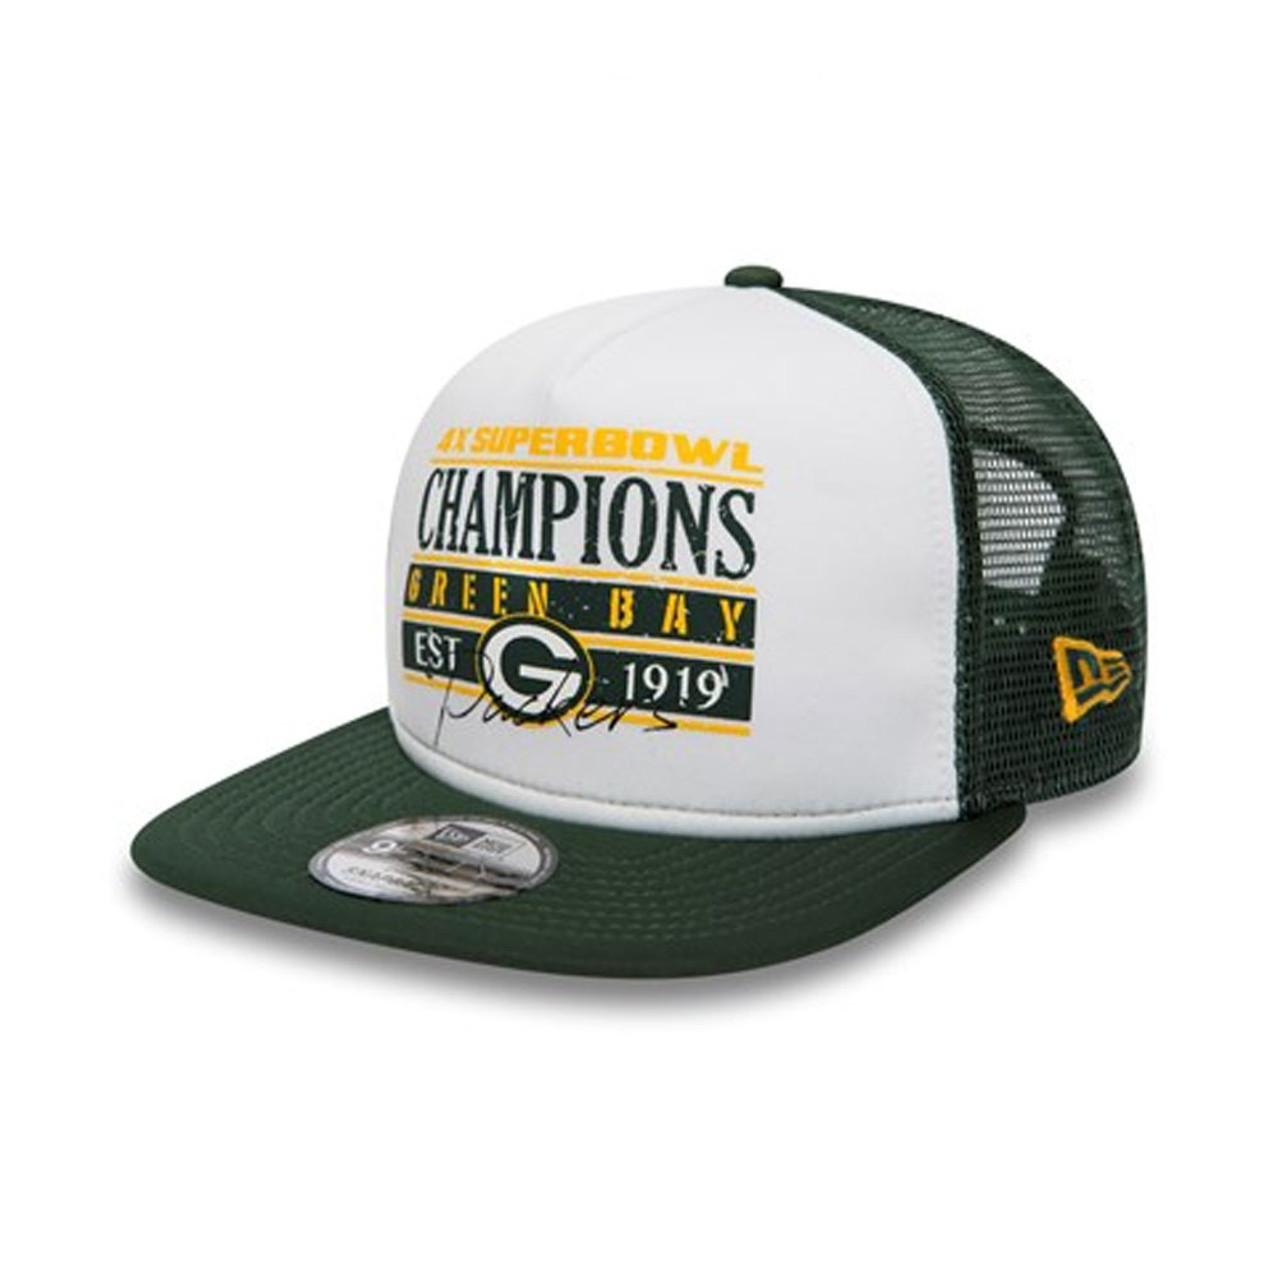 18755d25 NEW ERA Green Bay Packers Trucker cap small/medium [white/green]